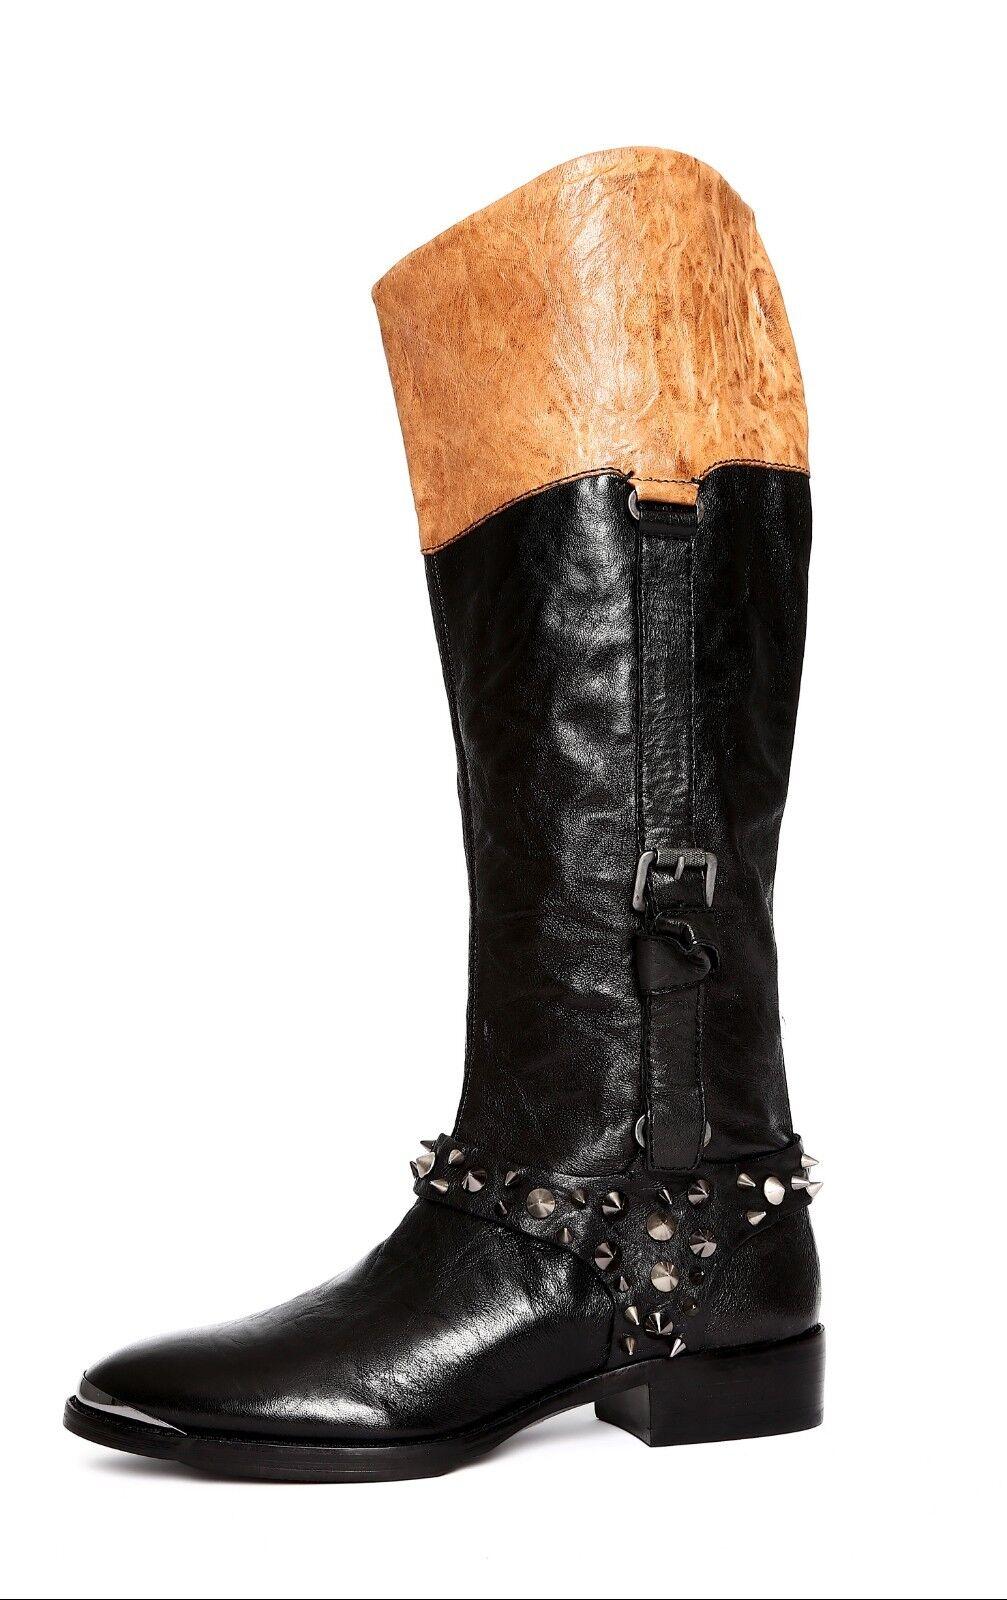 Sam Edelman Park Womens Tan Black Leather Boot Sz 7.5 2936